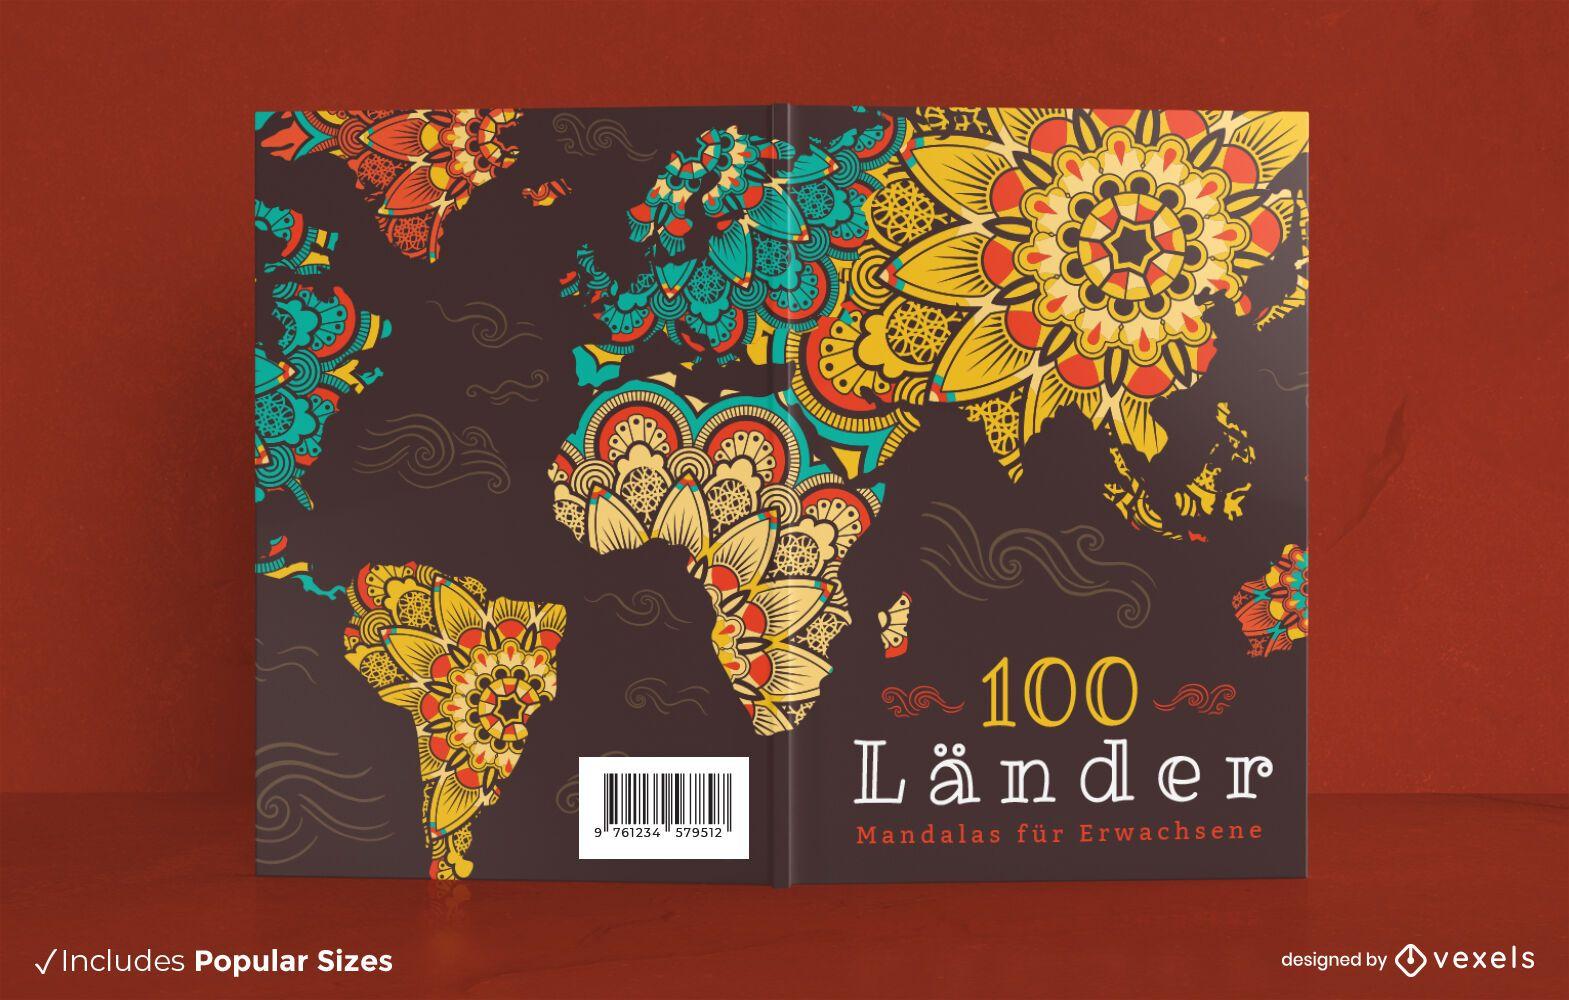 Weltkarten-Mandala-Blumen-Buchcover-Design